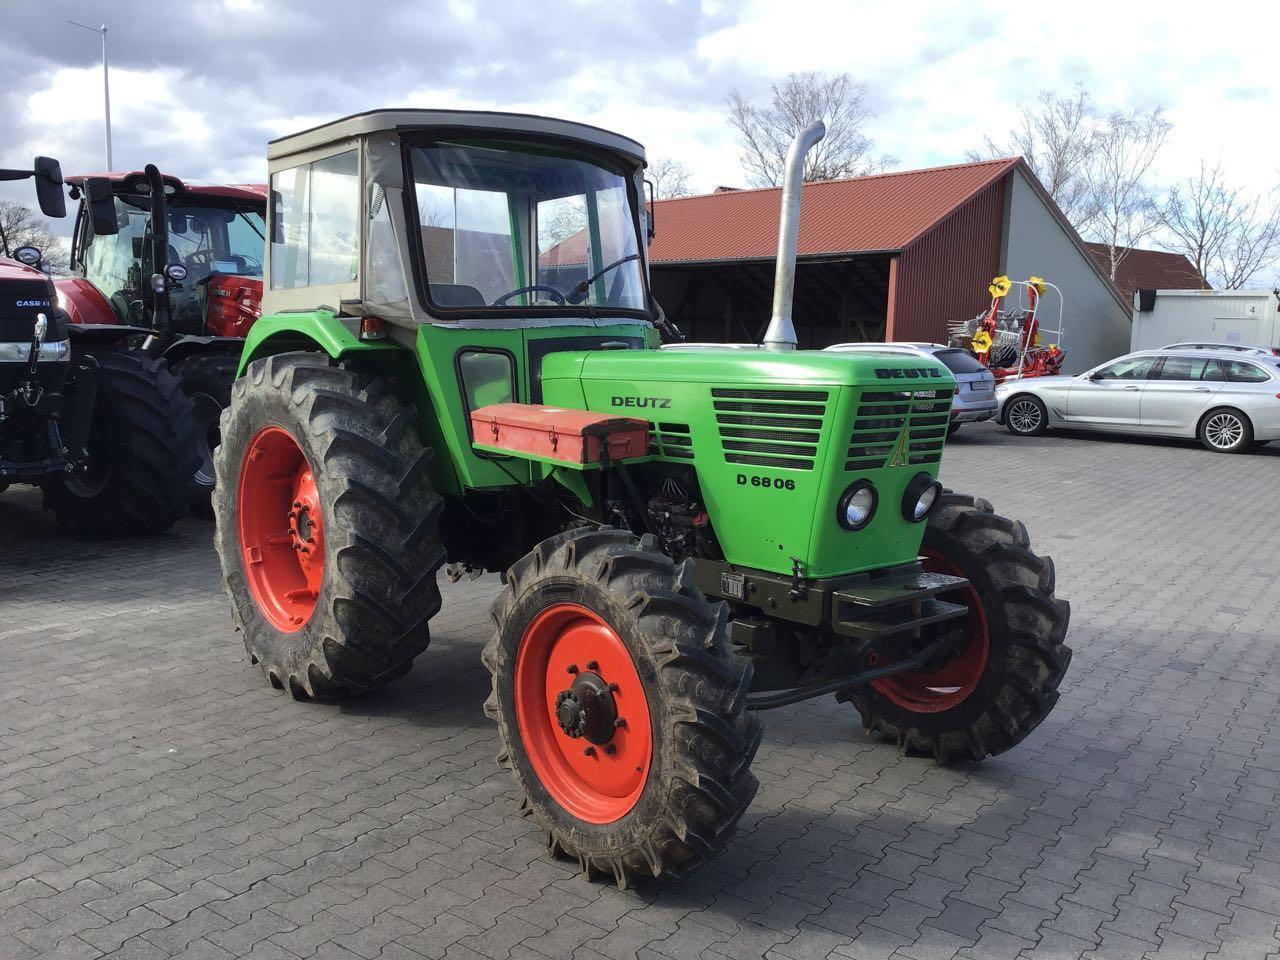 Deutz-Fahr 6806 A